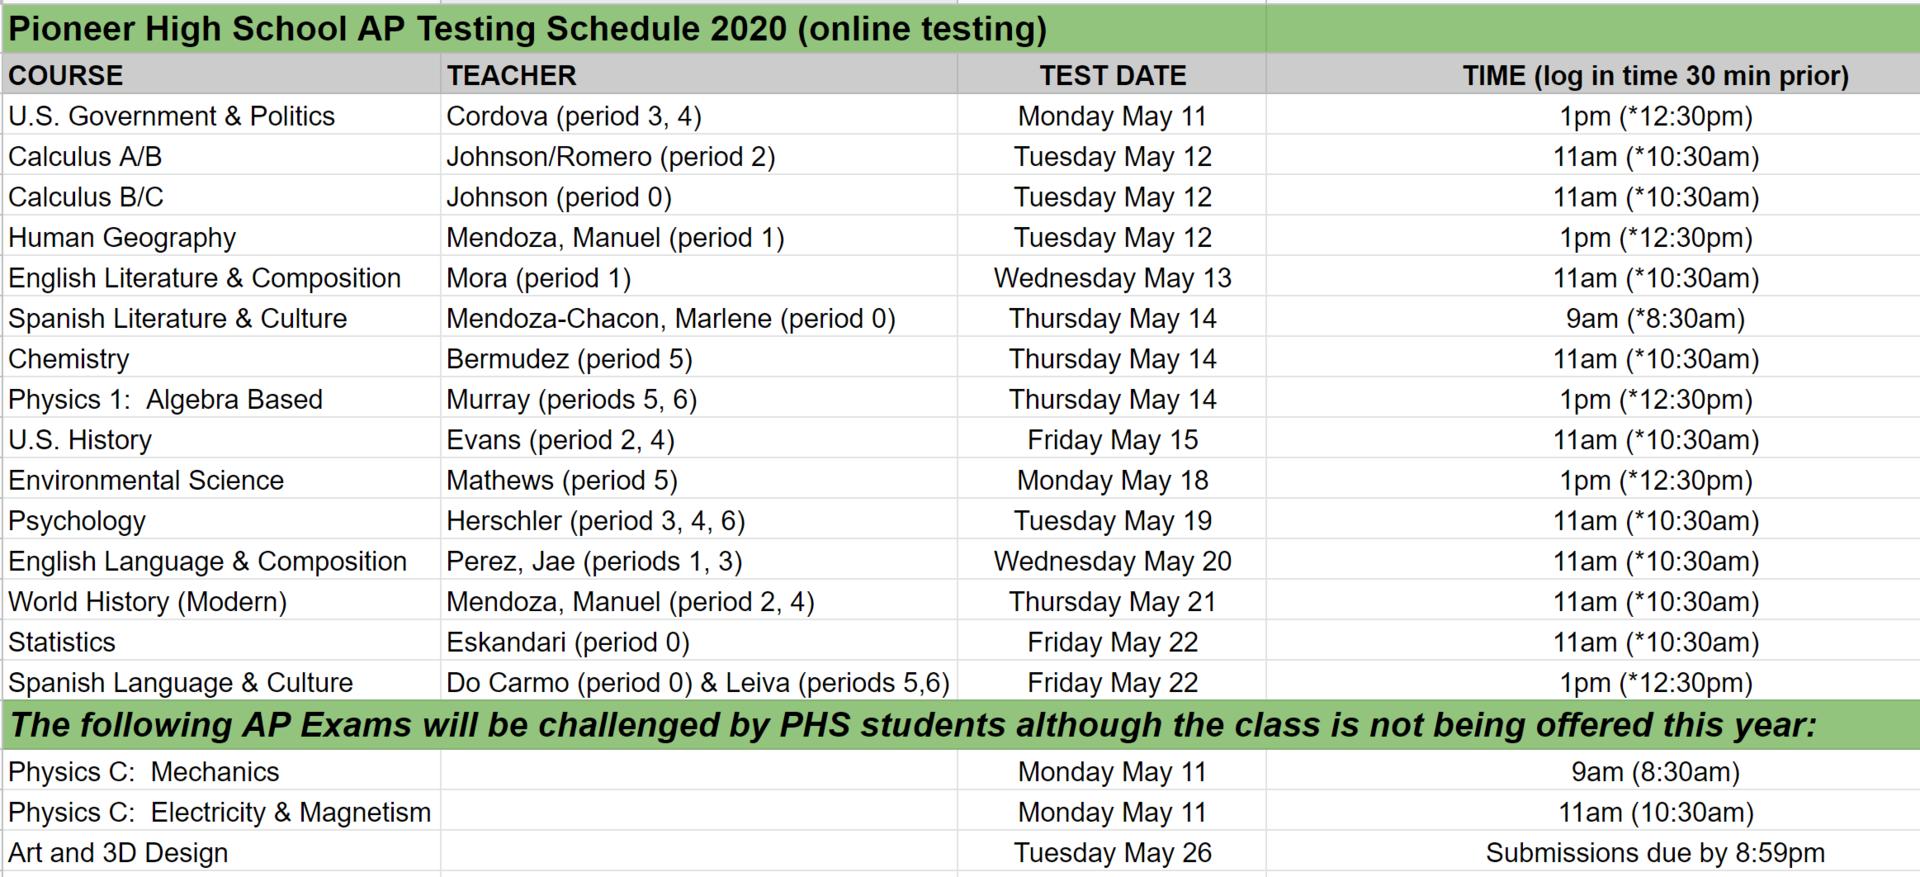 PHS AP Testing 2020